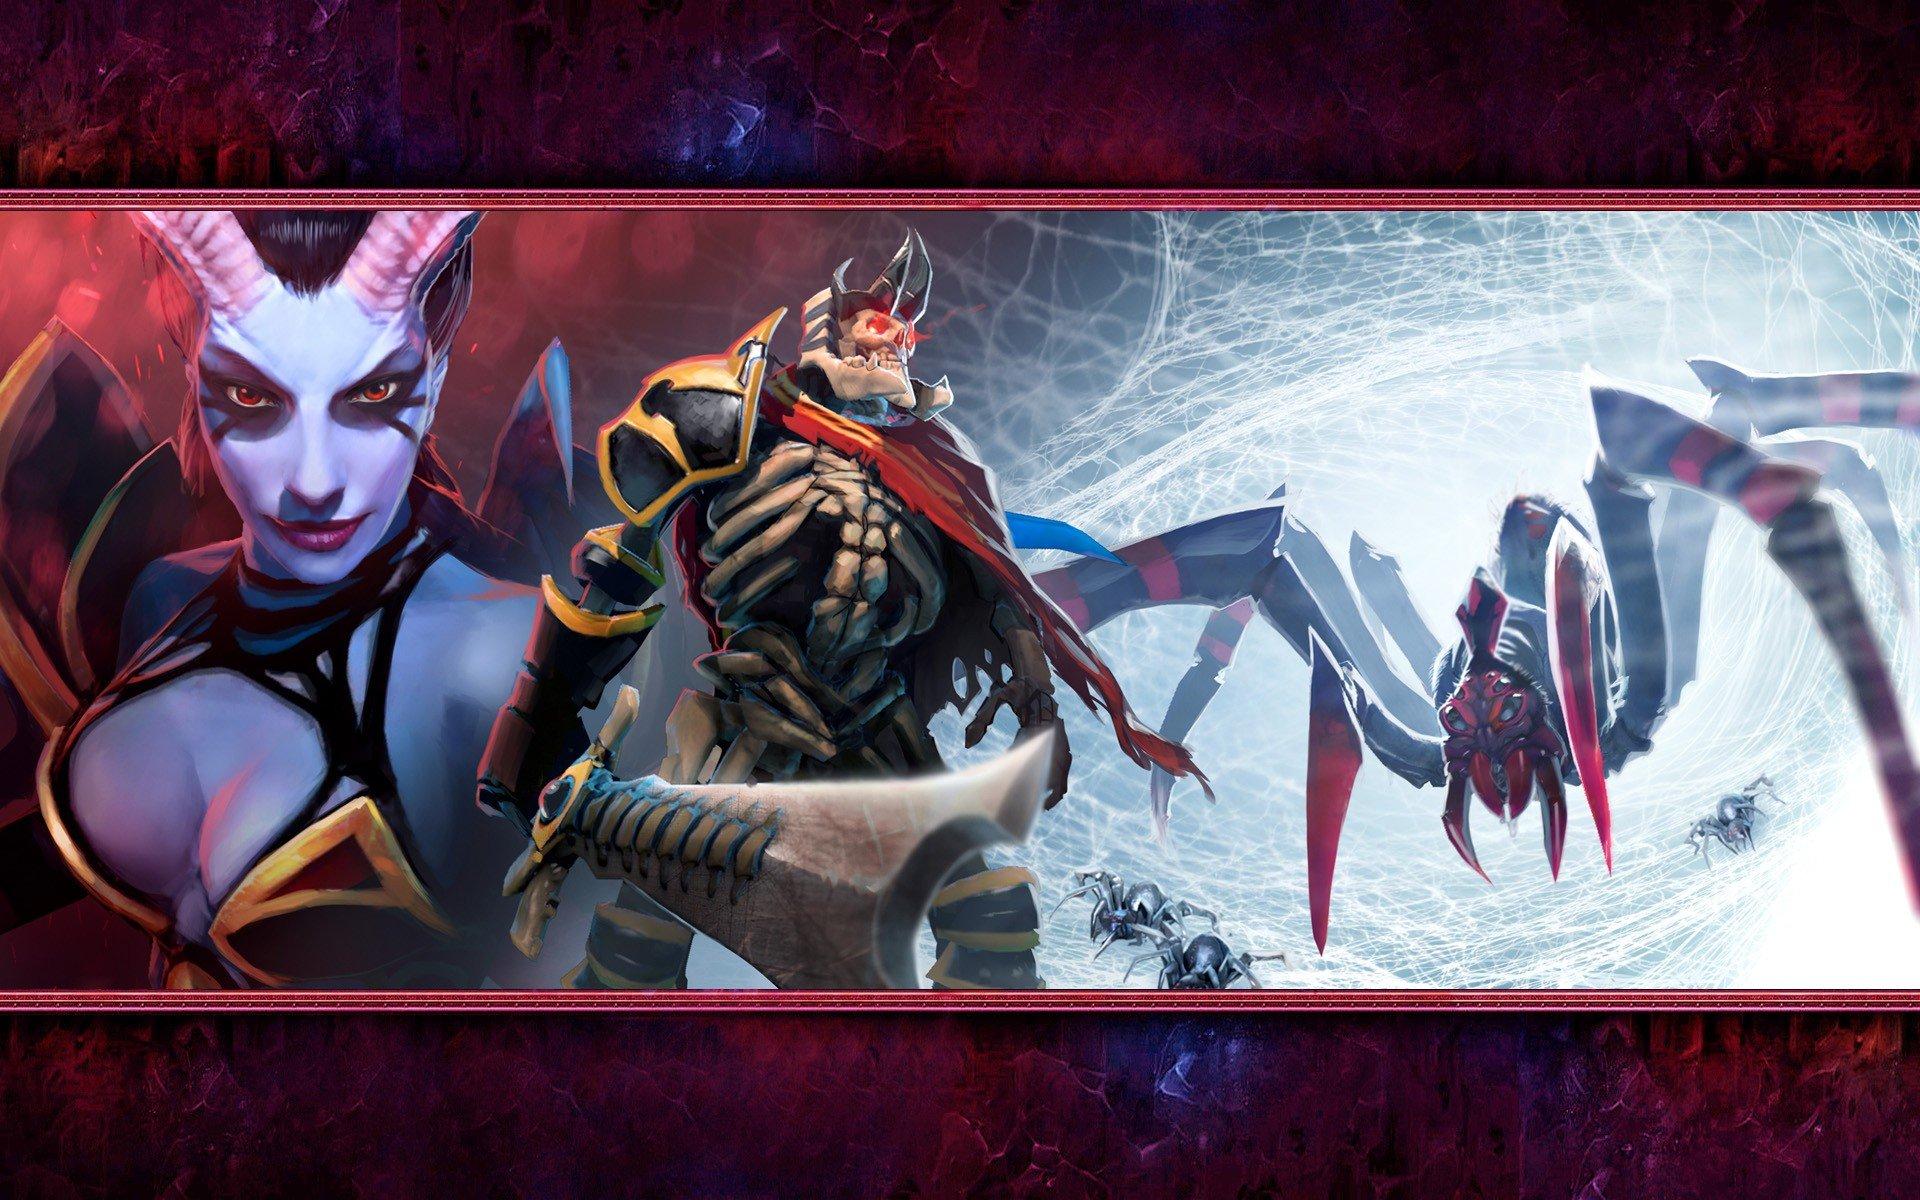 Video Games Valve Corporation Succubus Dota Dota 2 Queen Of Pain